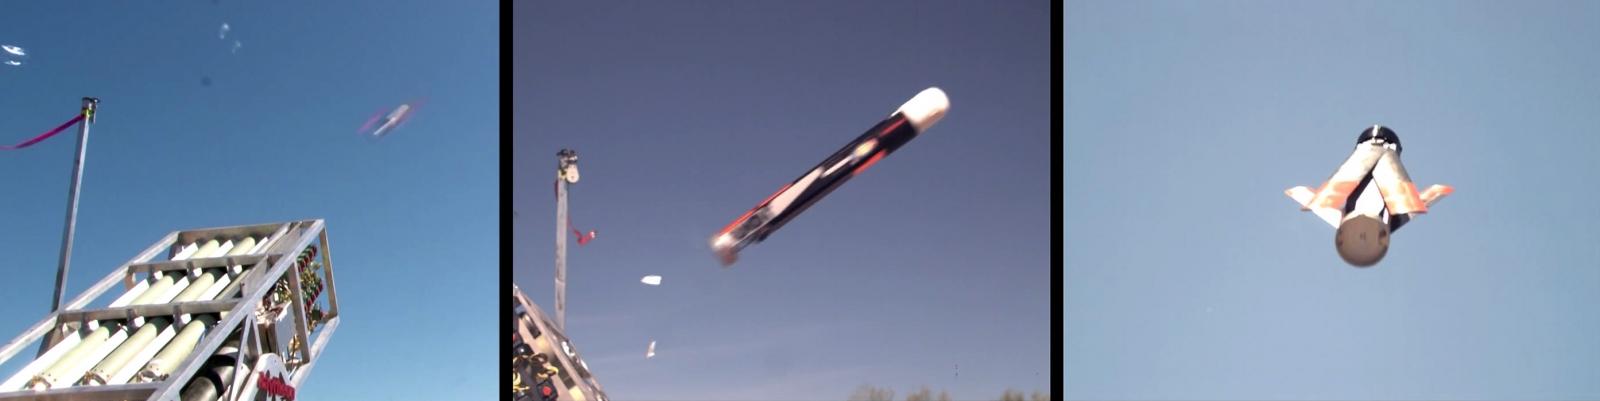 US Navy's LOCUST UAV launching cannon